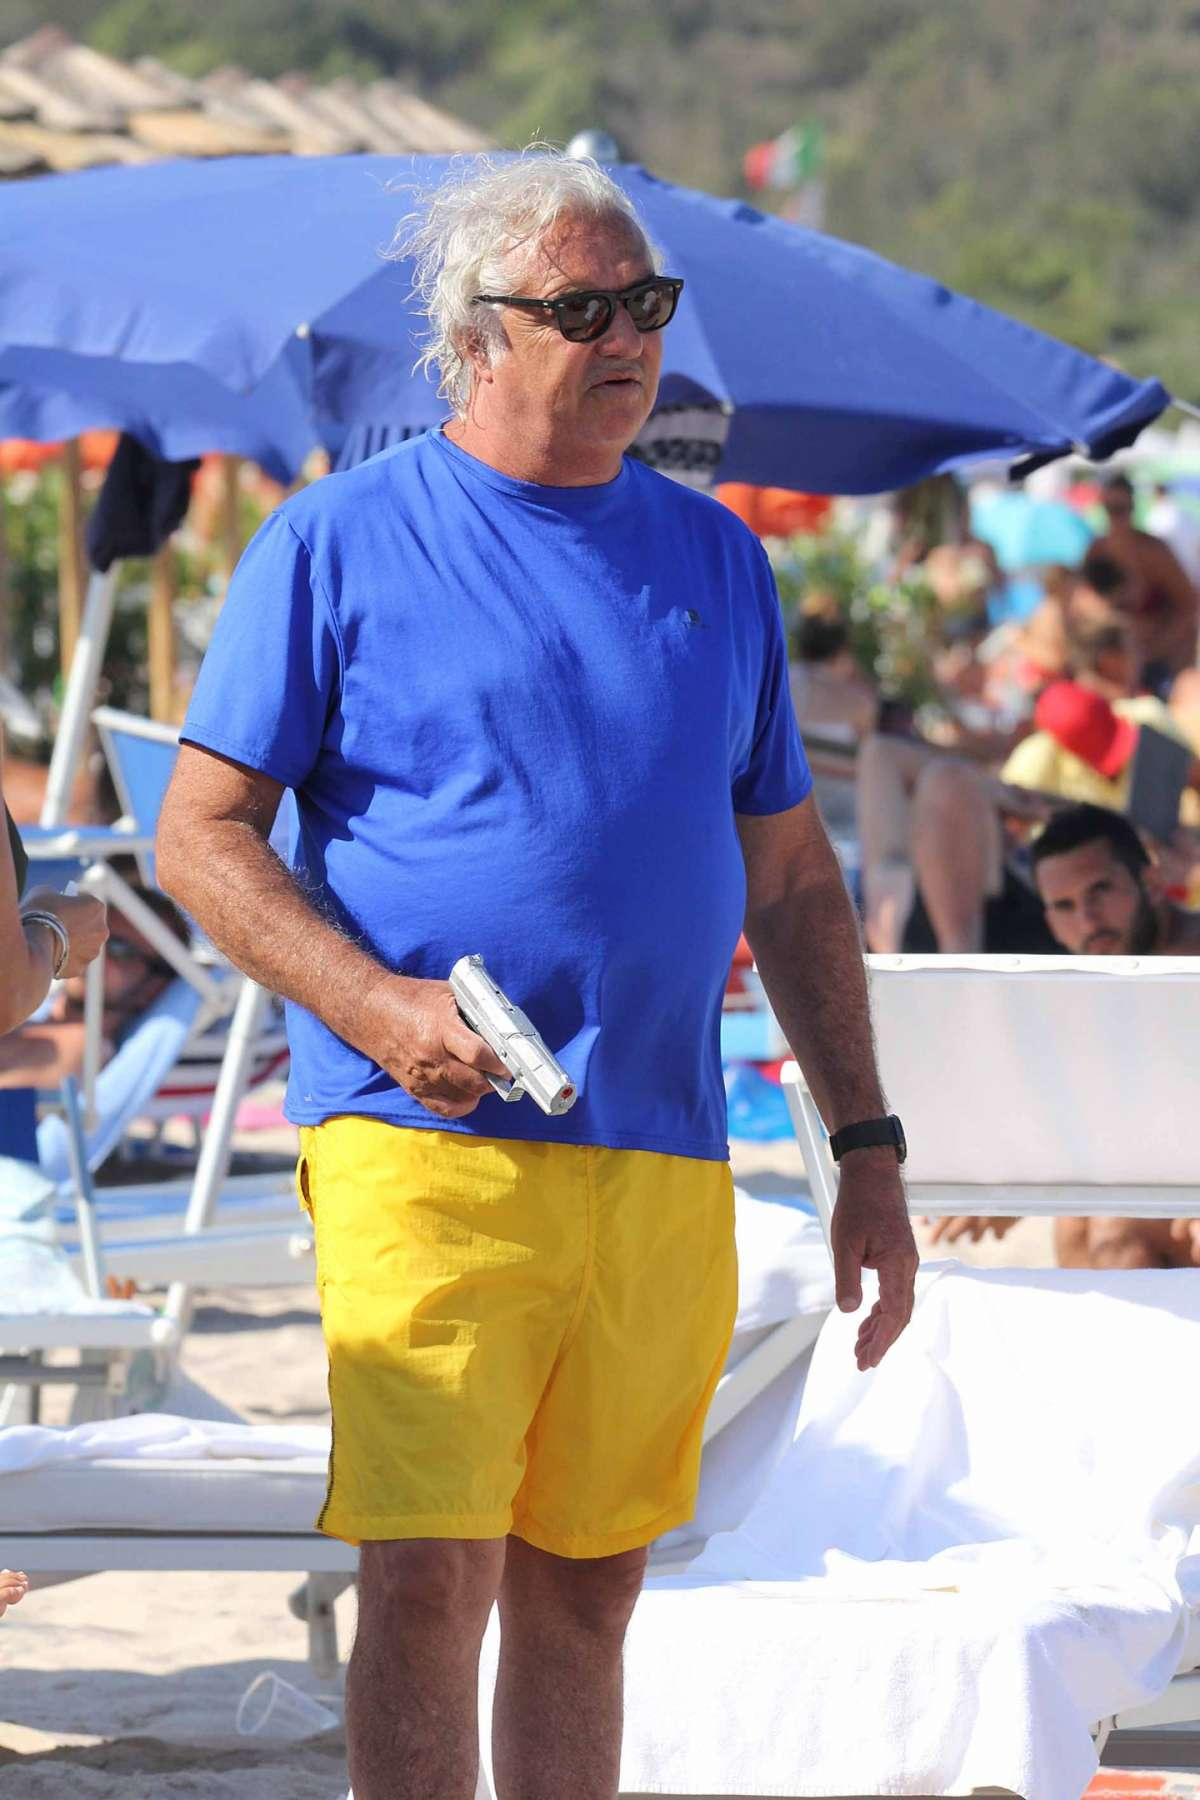 Il manager in costume in spiaggia